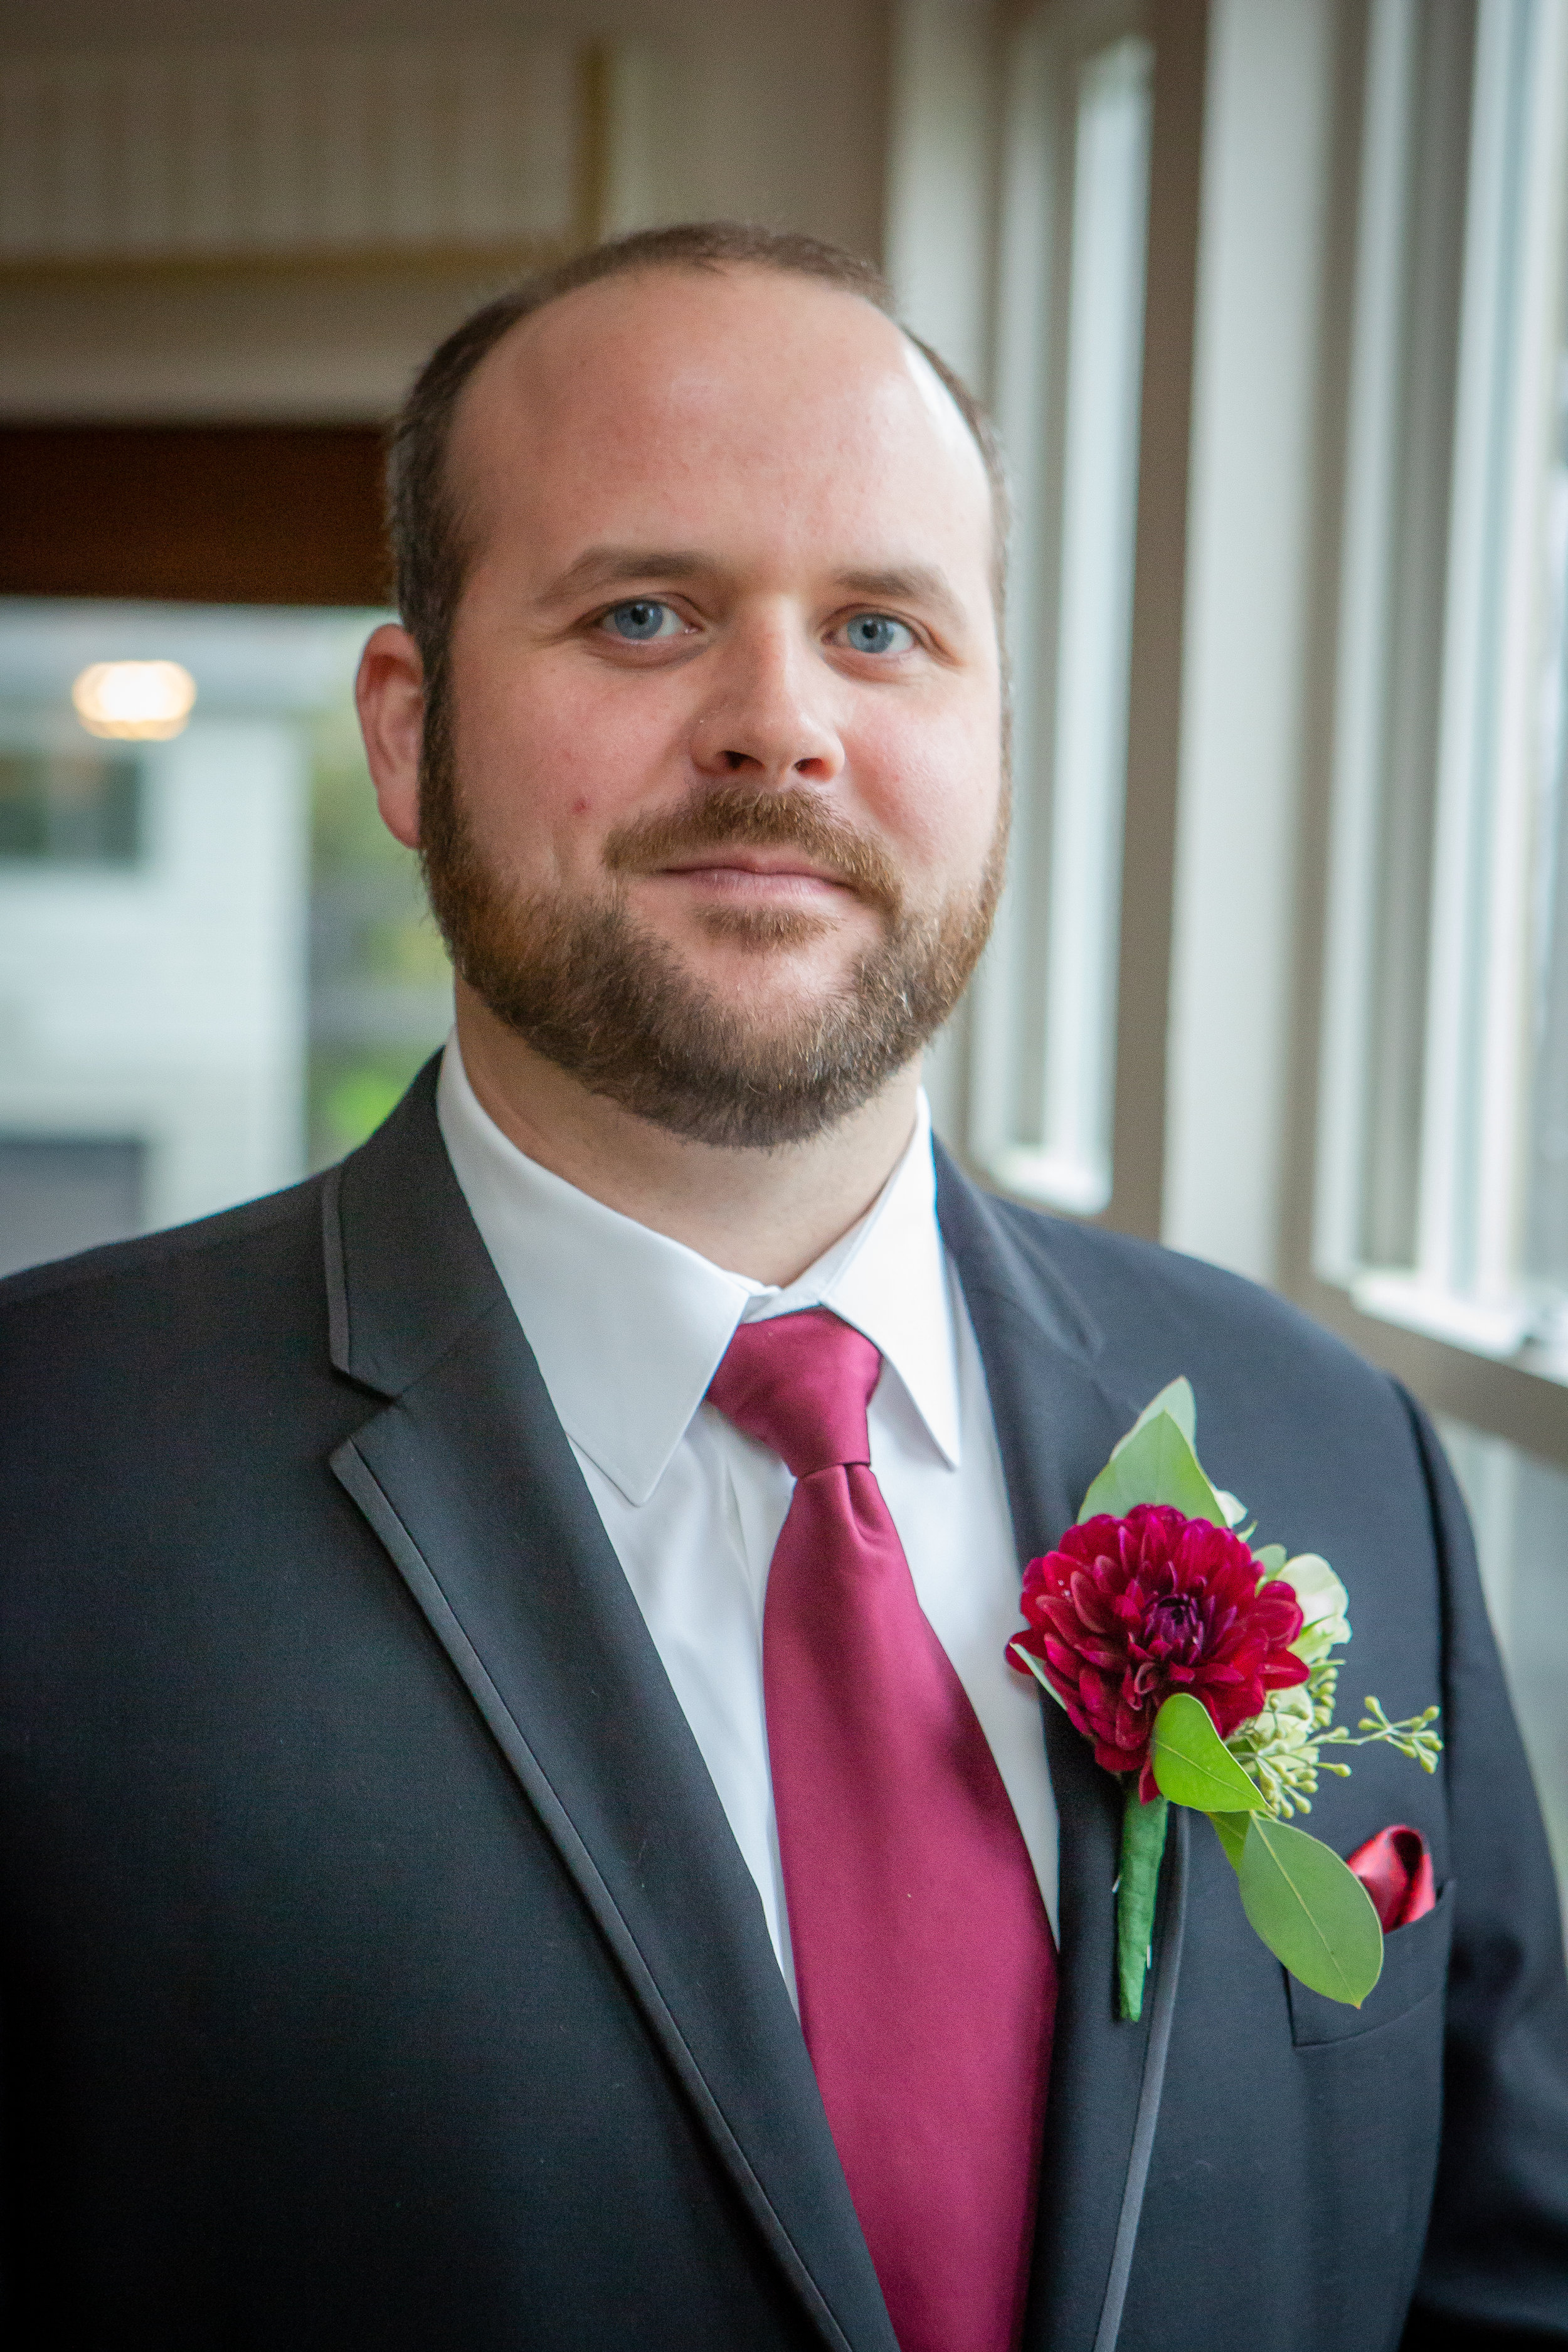 Wedding photo-groom's portrait